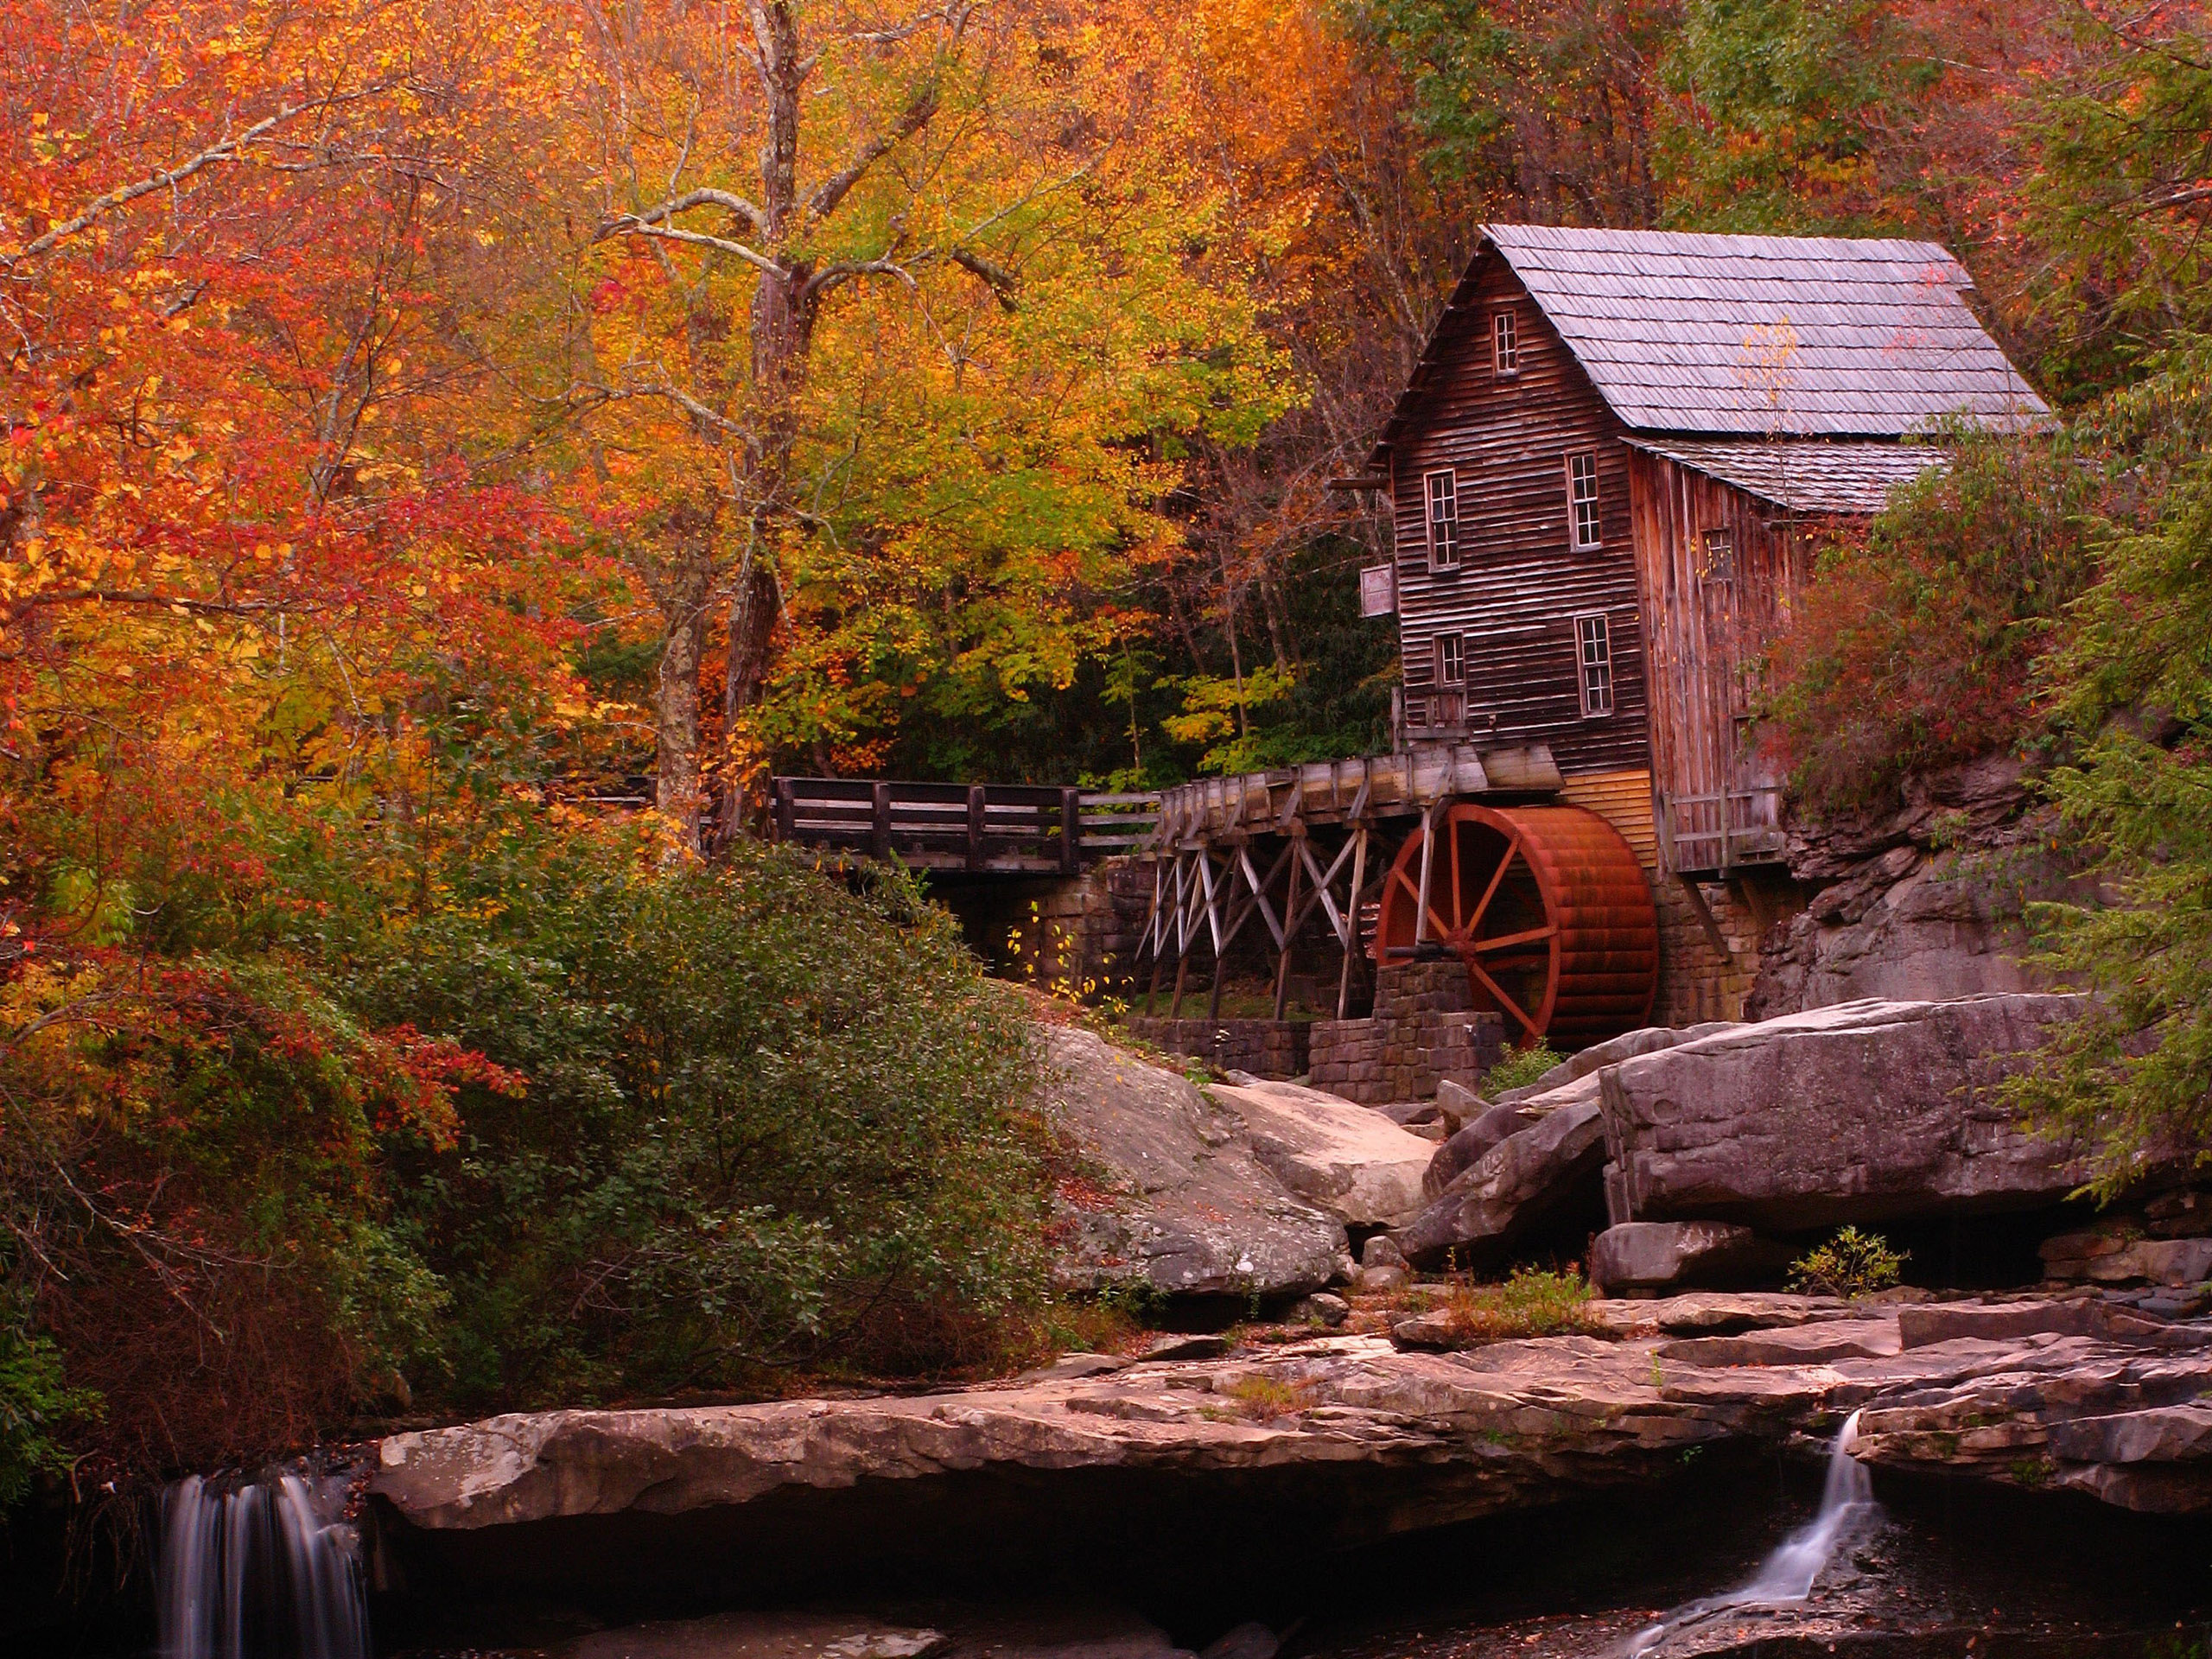 Autumn Landscape Wallpaper Wallpapersafari